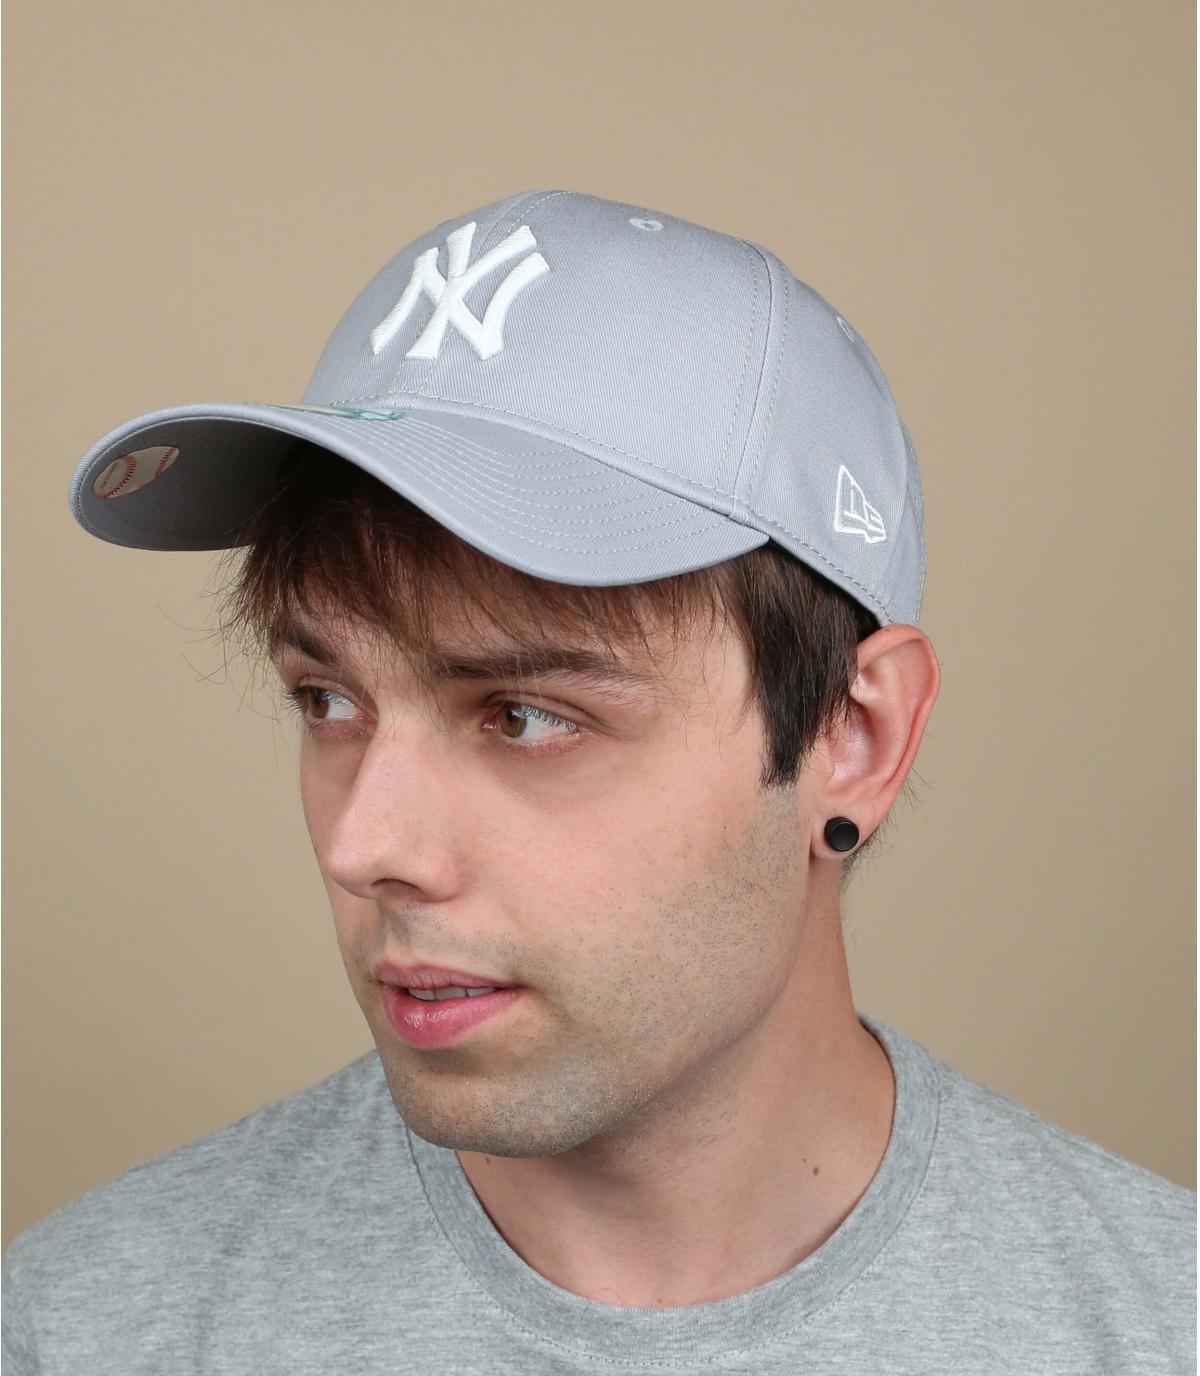 Casquette ajustable gris